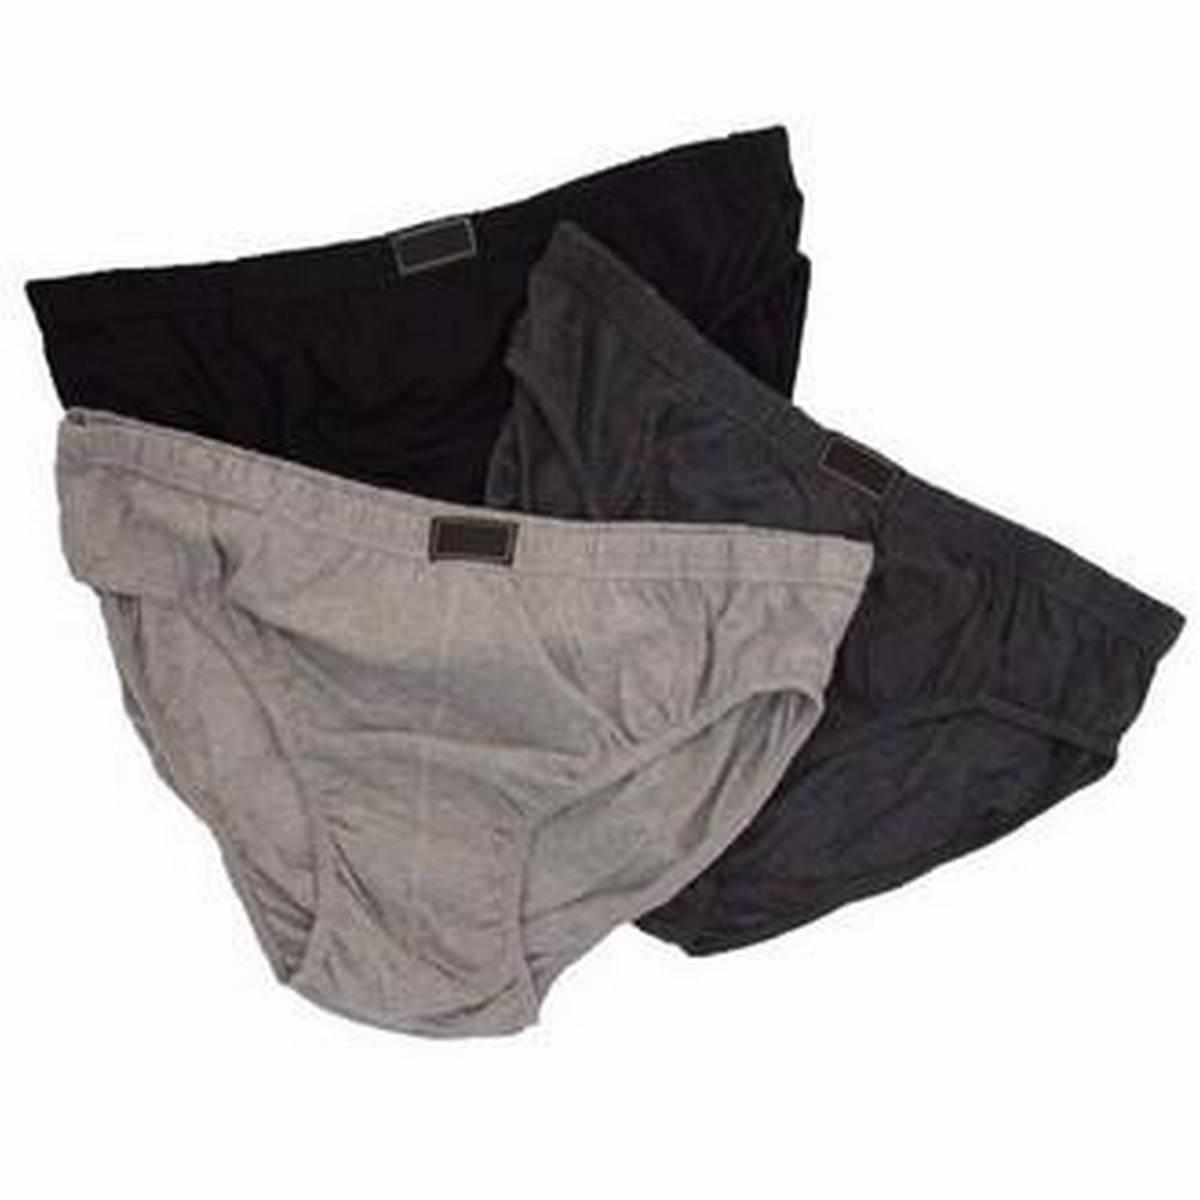 100% cotton Underwear For Men (classic)